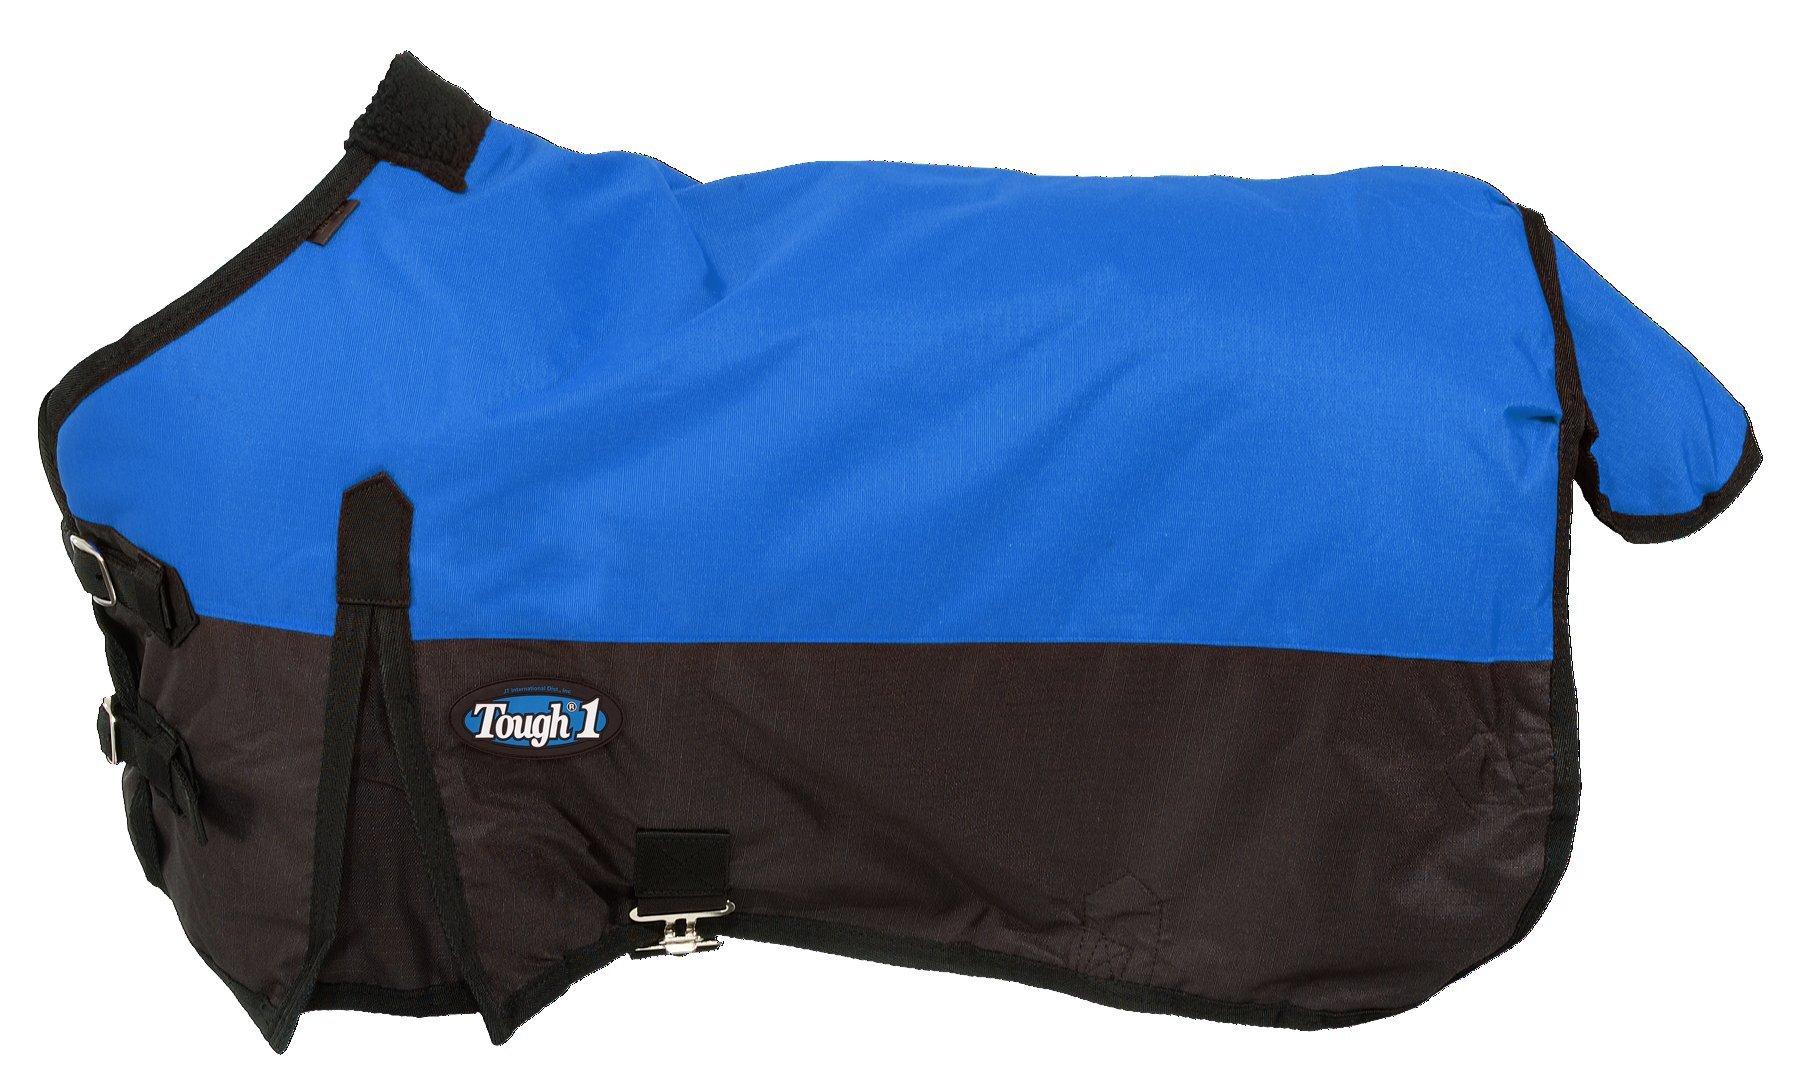 Tough 1 600D Waterproof Poly Miniature Turnout Blanket, Royal Blue, 50''